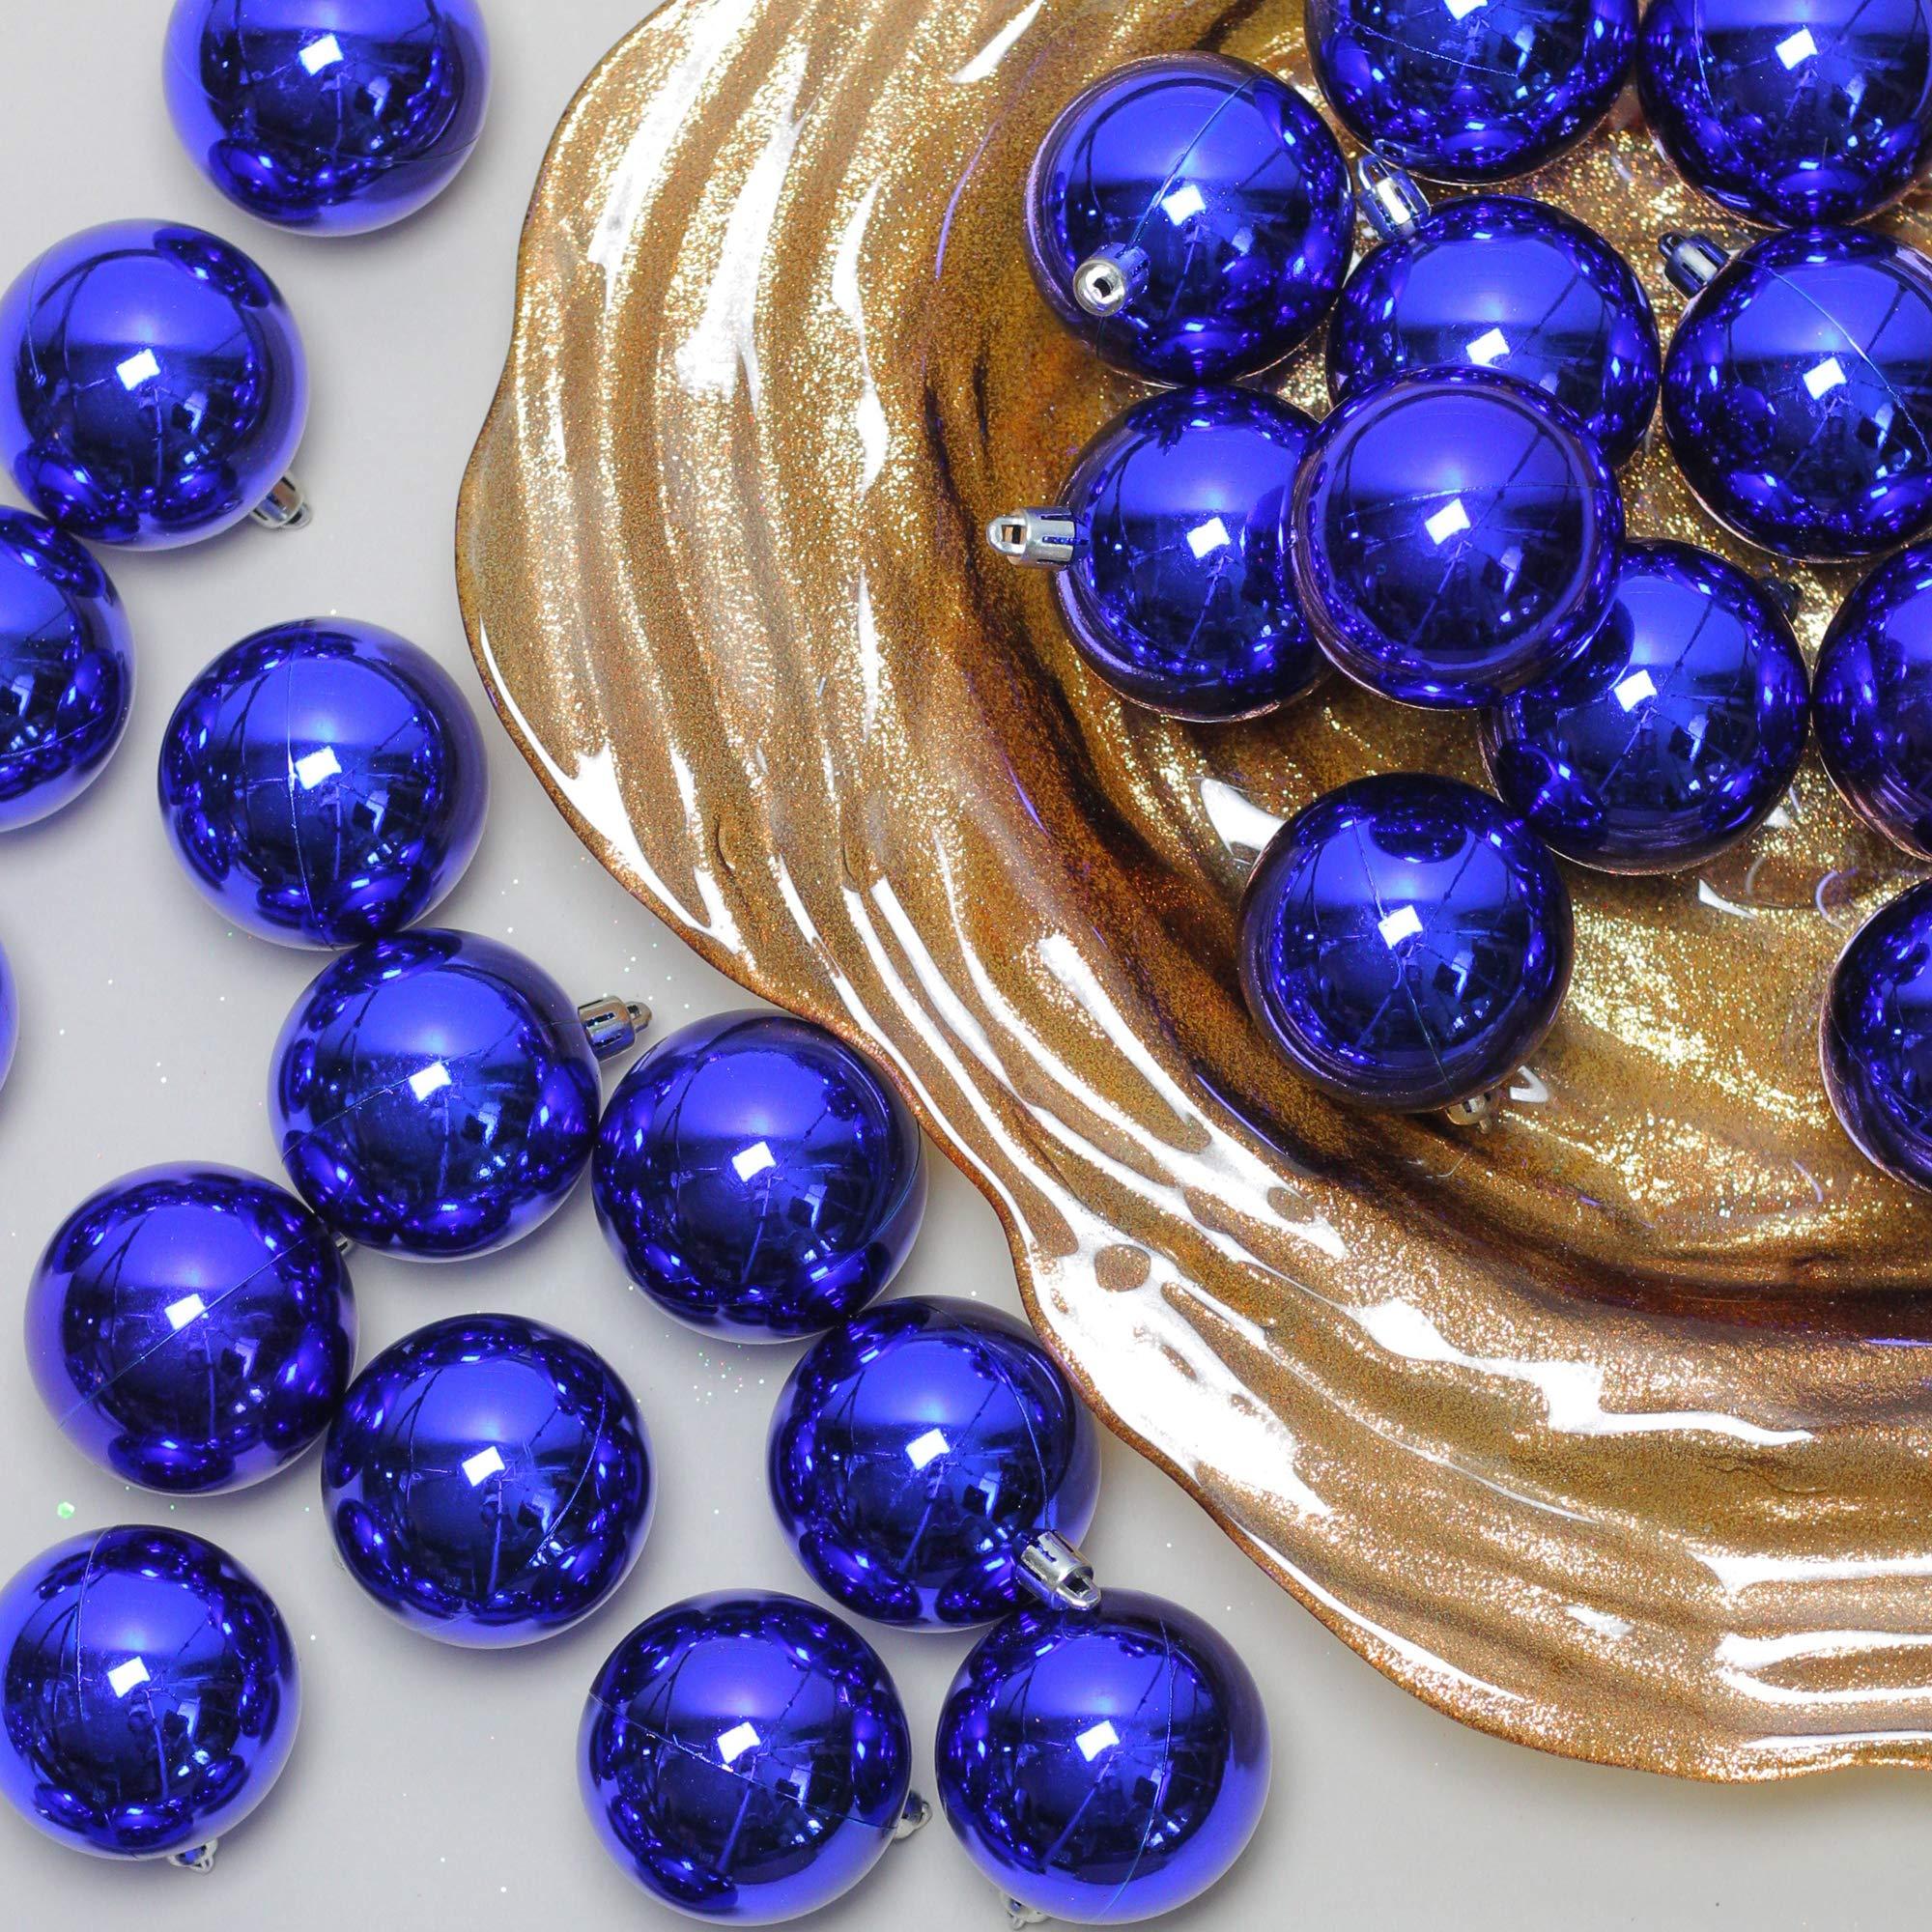 Northlight 60ct Royal Blue Shatterproof Shiny Christmas Ball Ornaments 2.5'' (60mm)